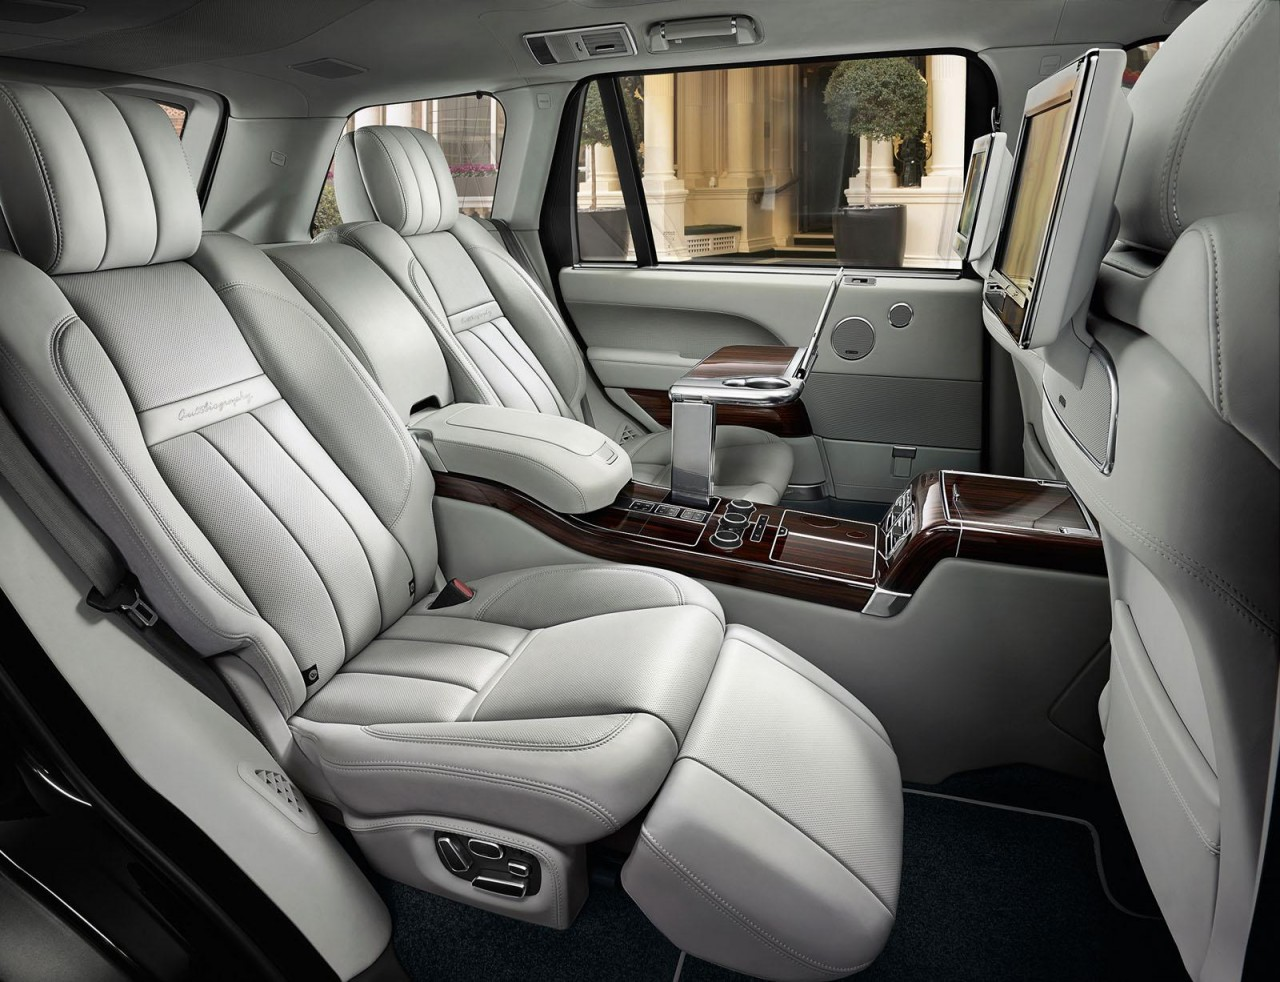 range rover svautobiography revealed new super luxury variant performancedrive. Black Bedroom Furniture Sets. Home Design Ideas